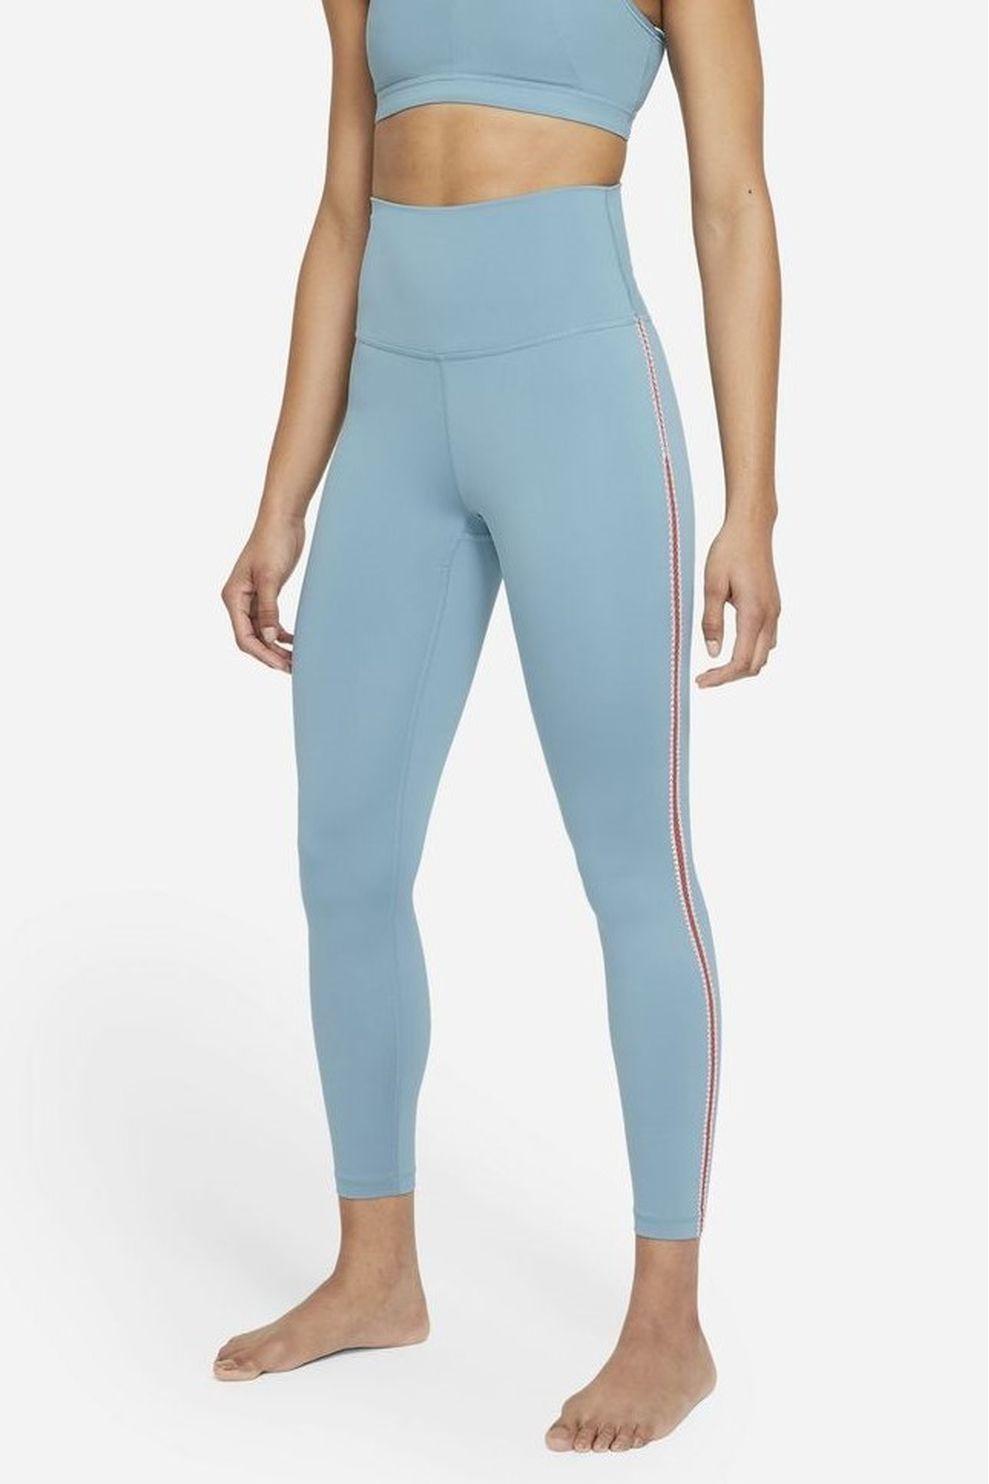 Nike Legging W 7/8 Yoga Crochet Tights voor dames - Blauw - Maten: XS, S, M, L, XL